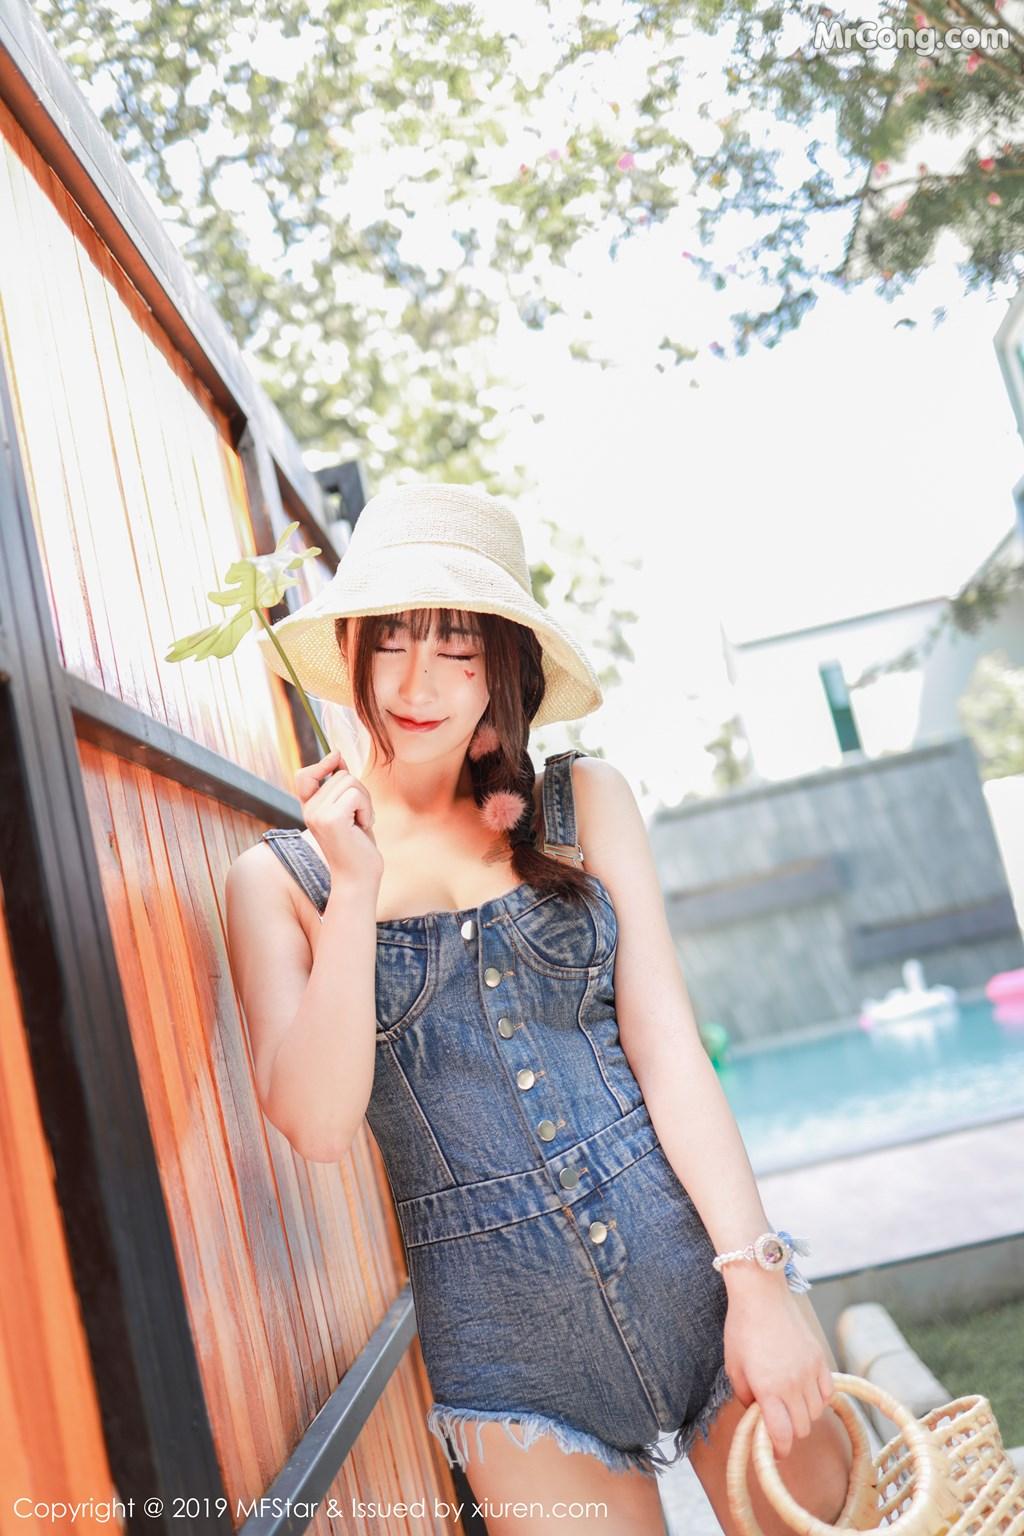 Image MFStar-Vol.228-Betty-MrCong.com-009 in post MFStar Vol.228: Betty林子欣 (58 ảnh)